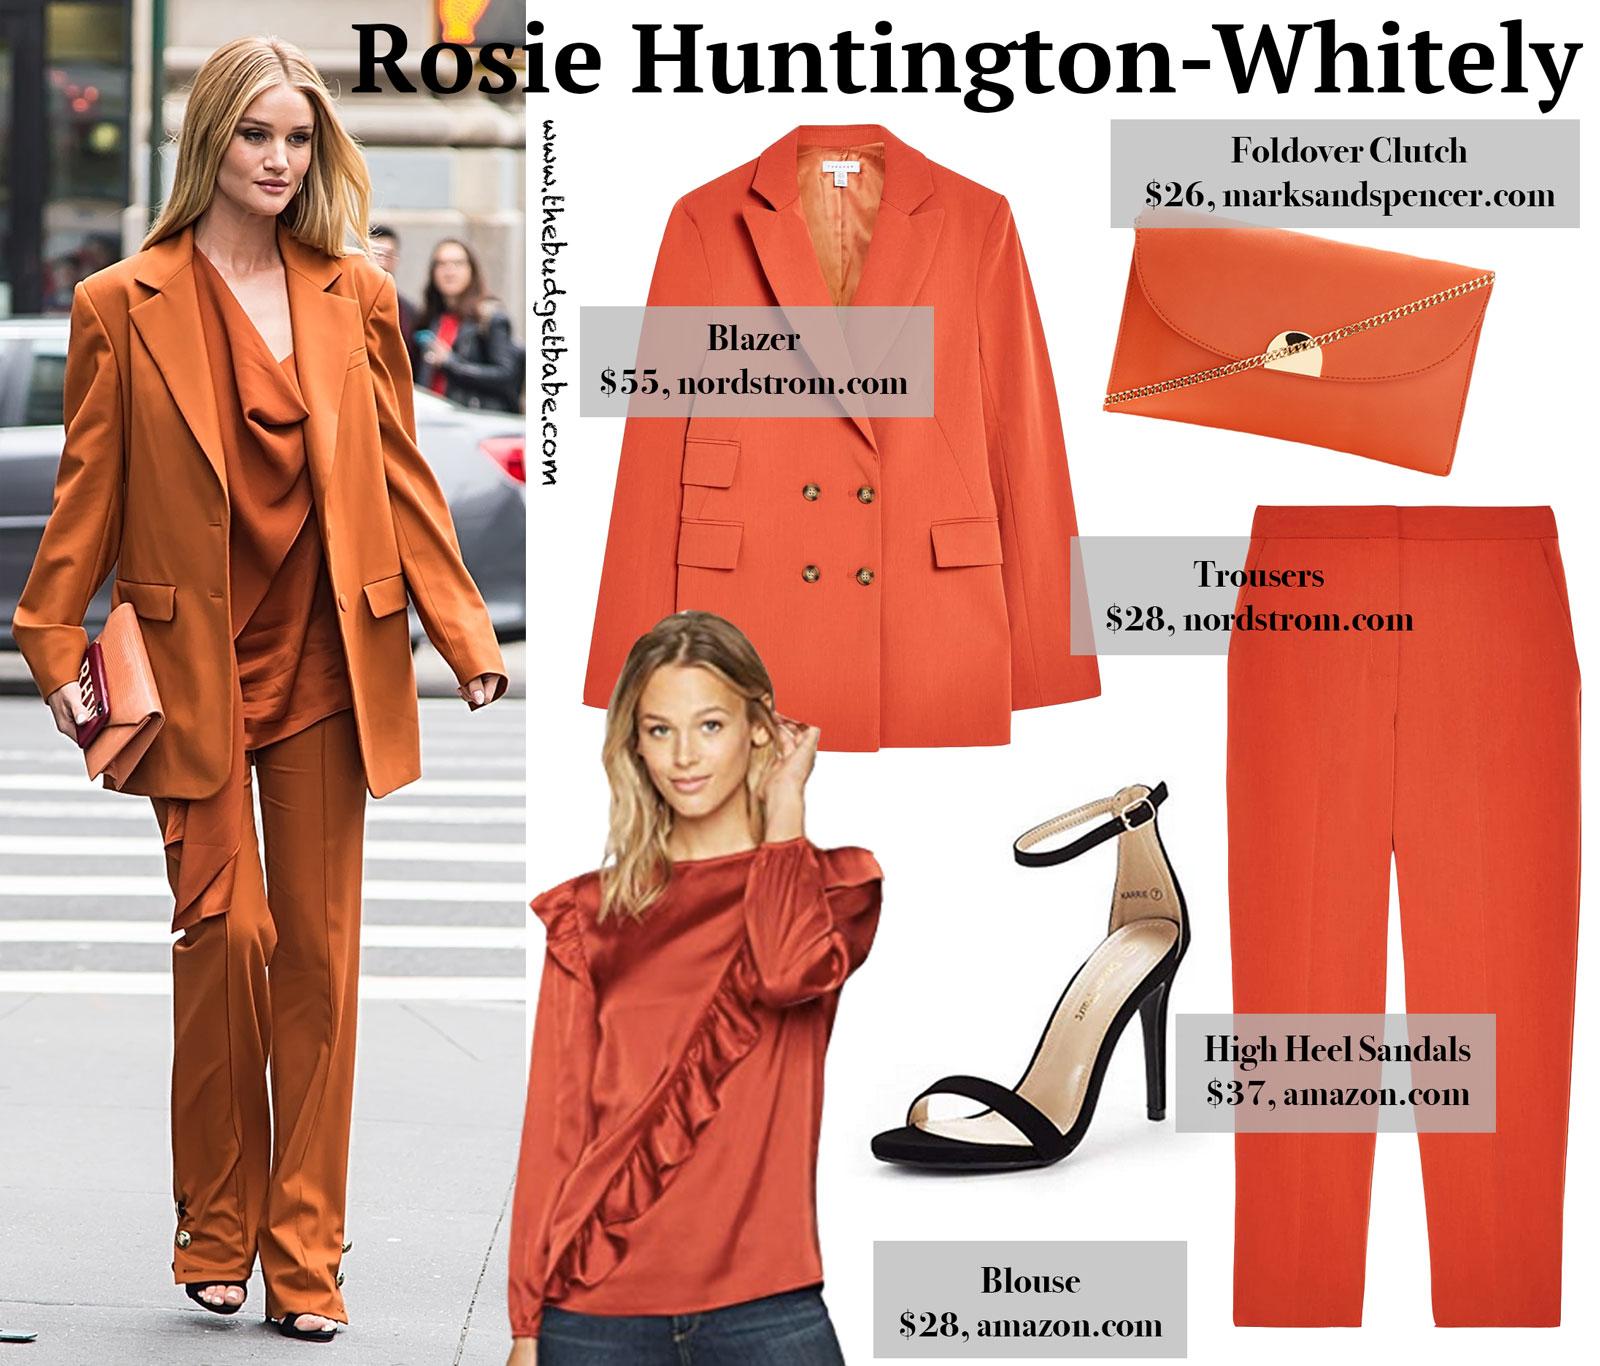 f3714ee08932 Rosie Huntington-Whitely Rust Orange Suit Look for Less